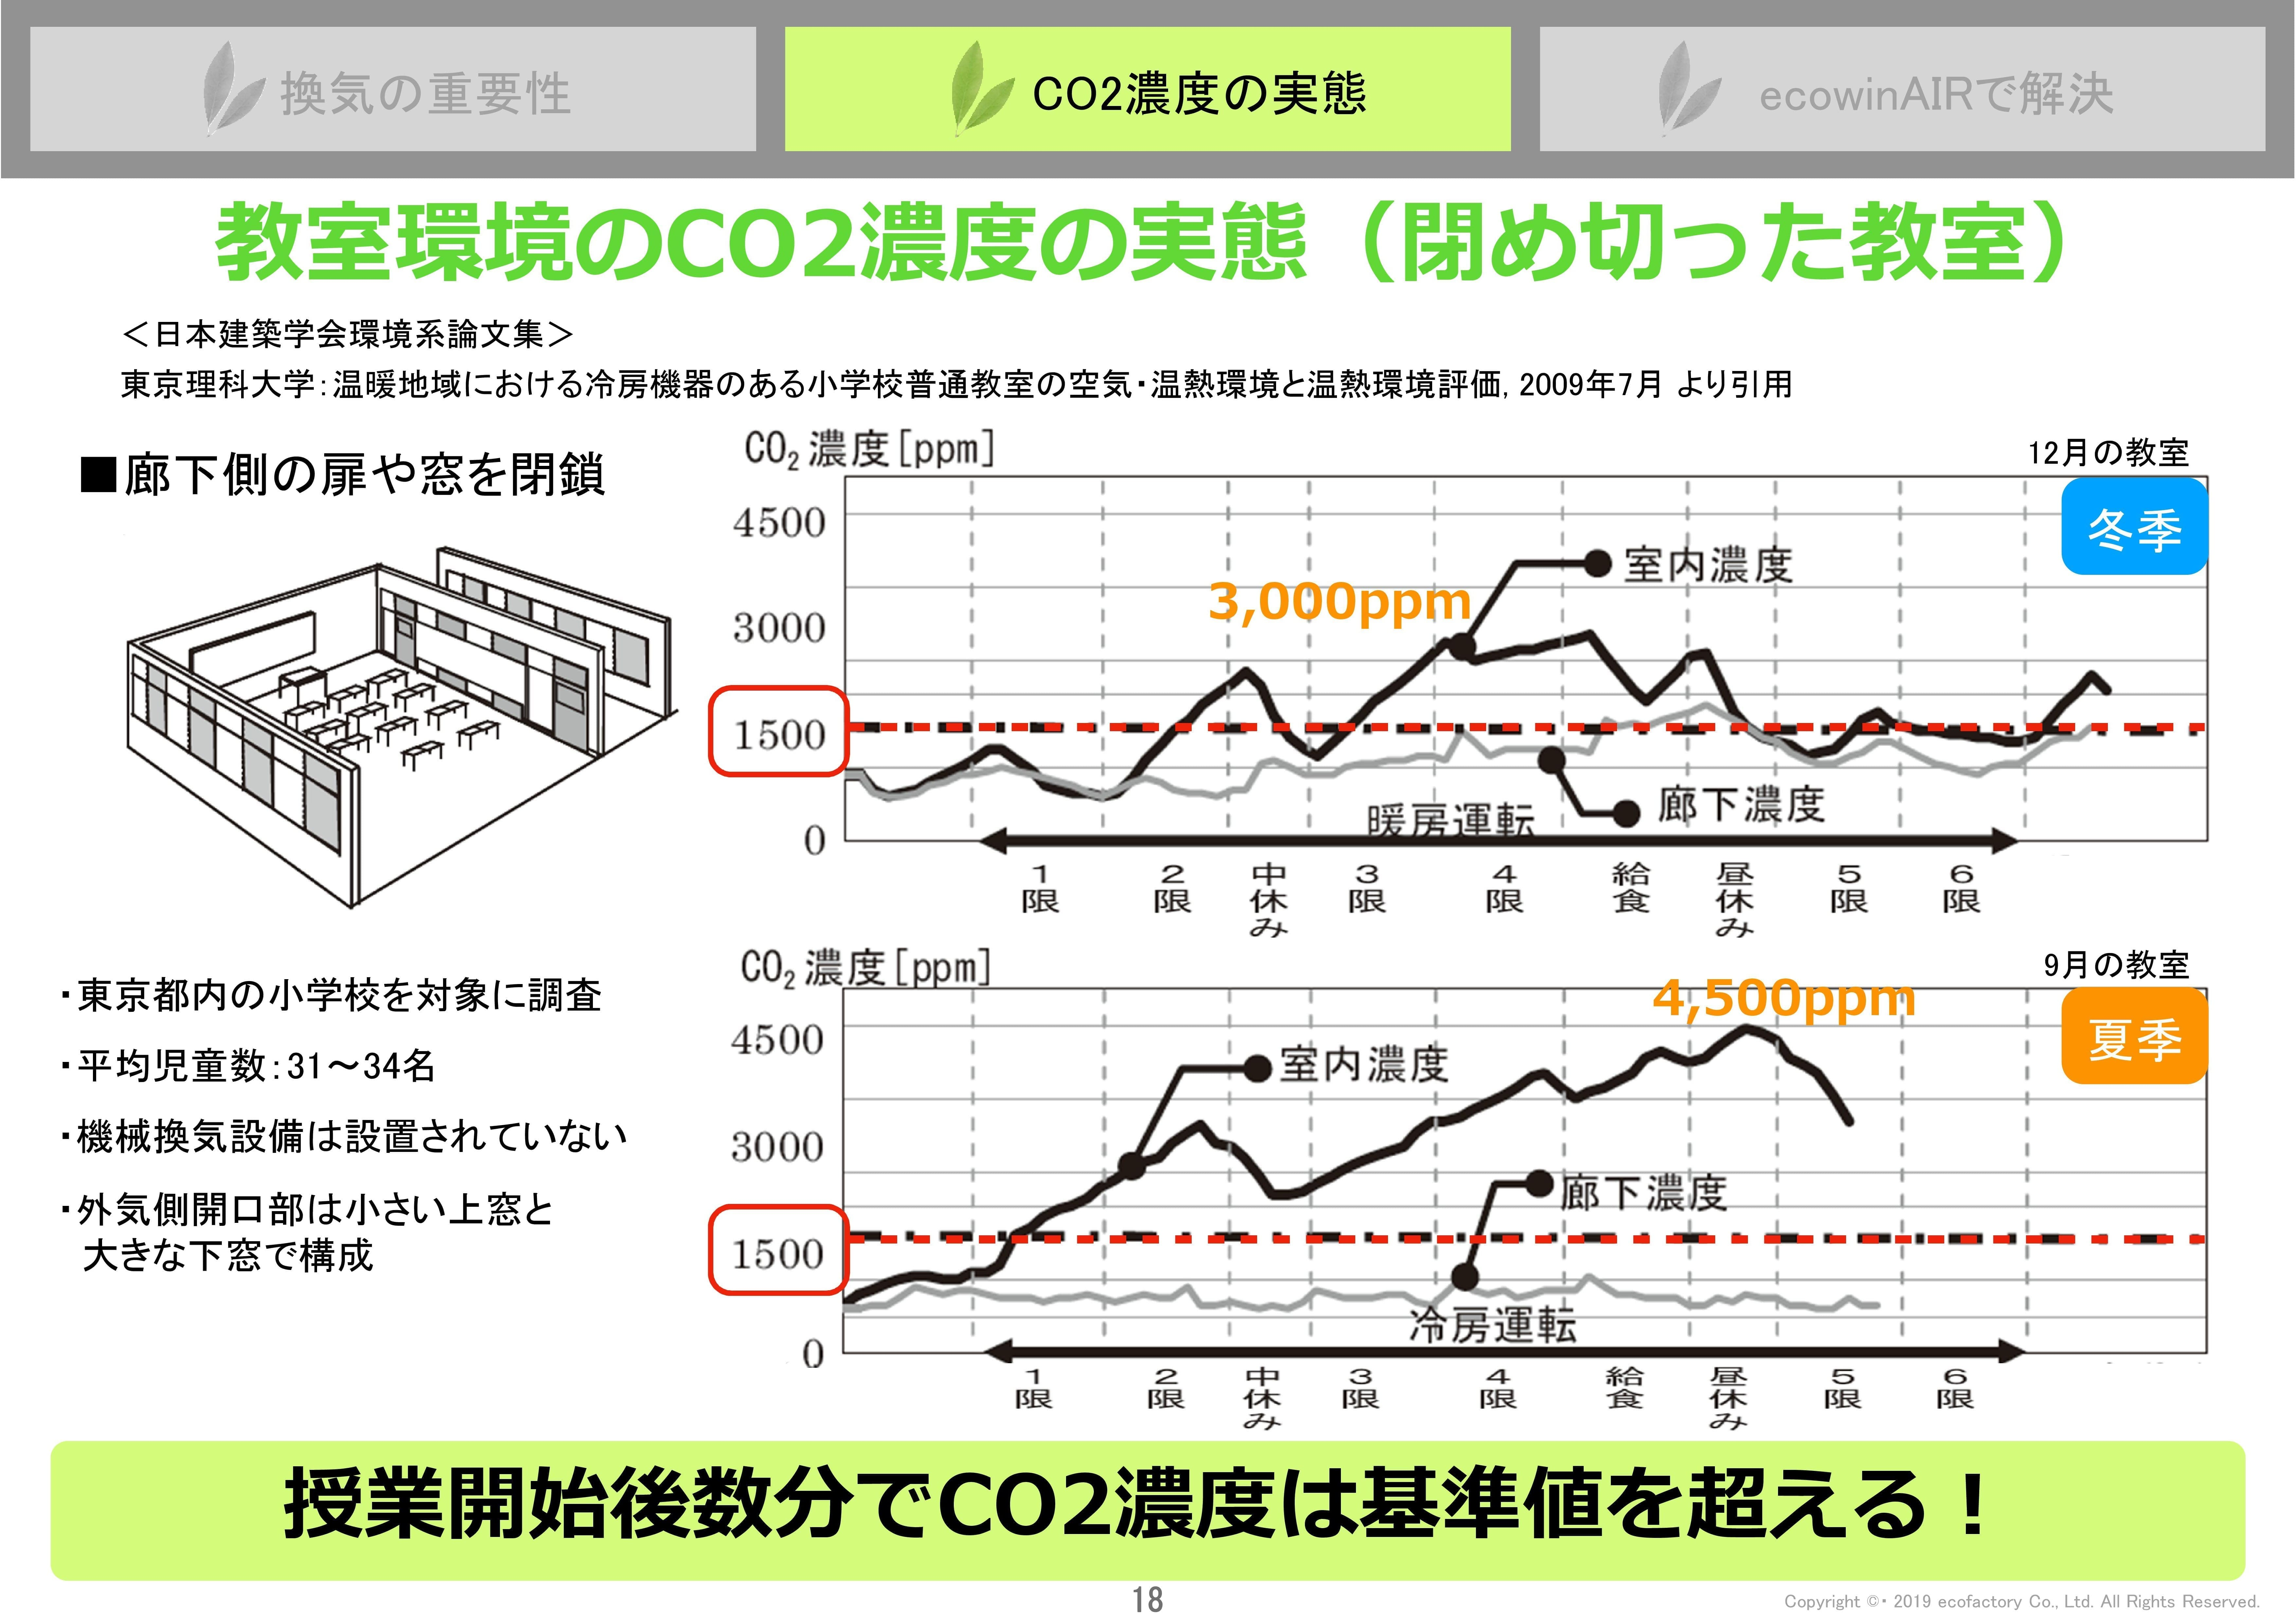 Microsoft PowerPoint - 業務用ecowinAIRご提案書(仮編集)